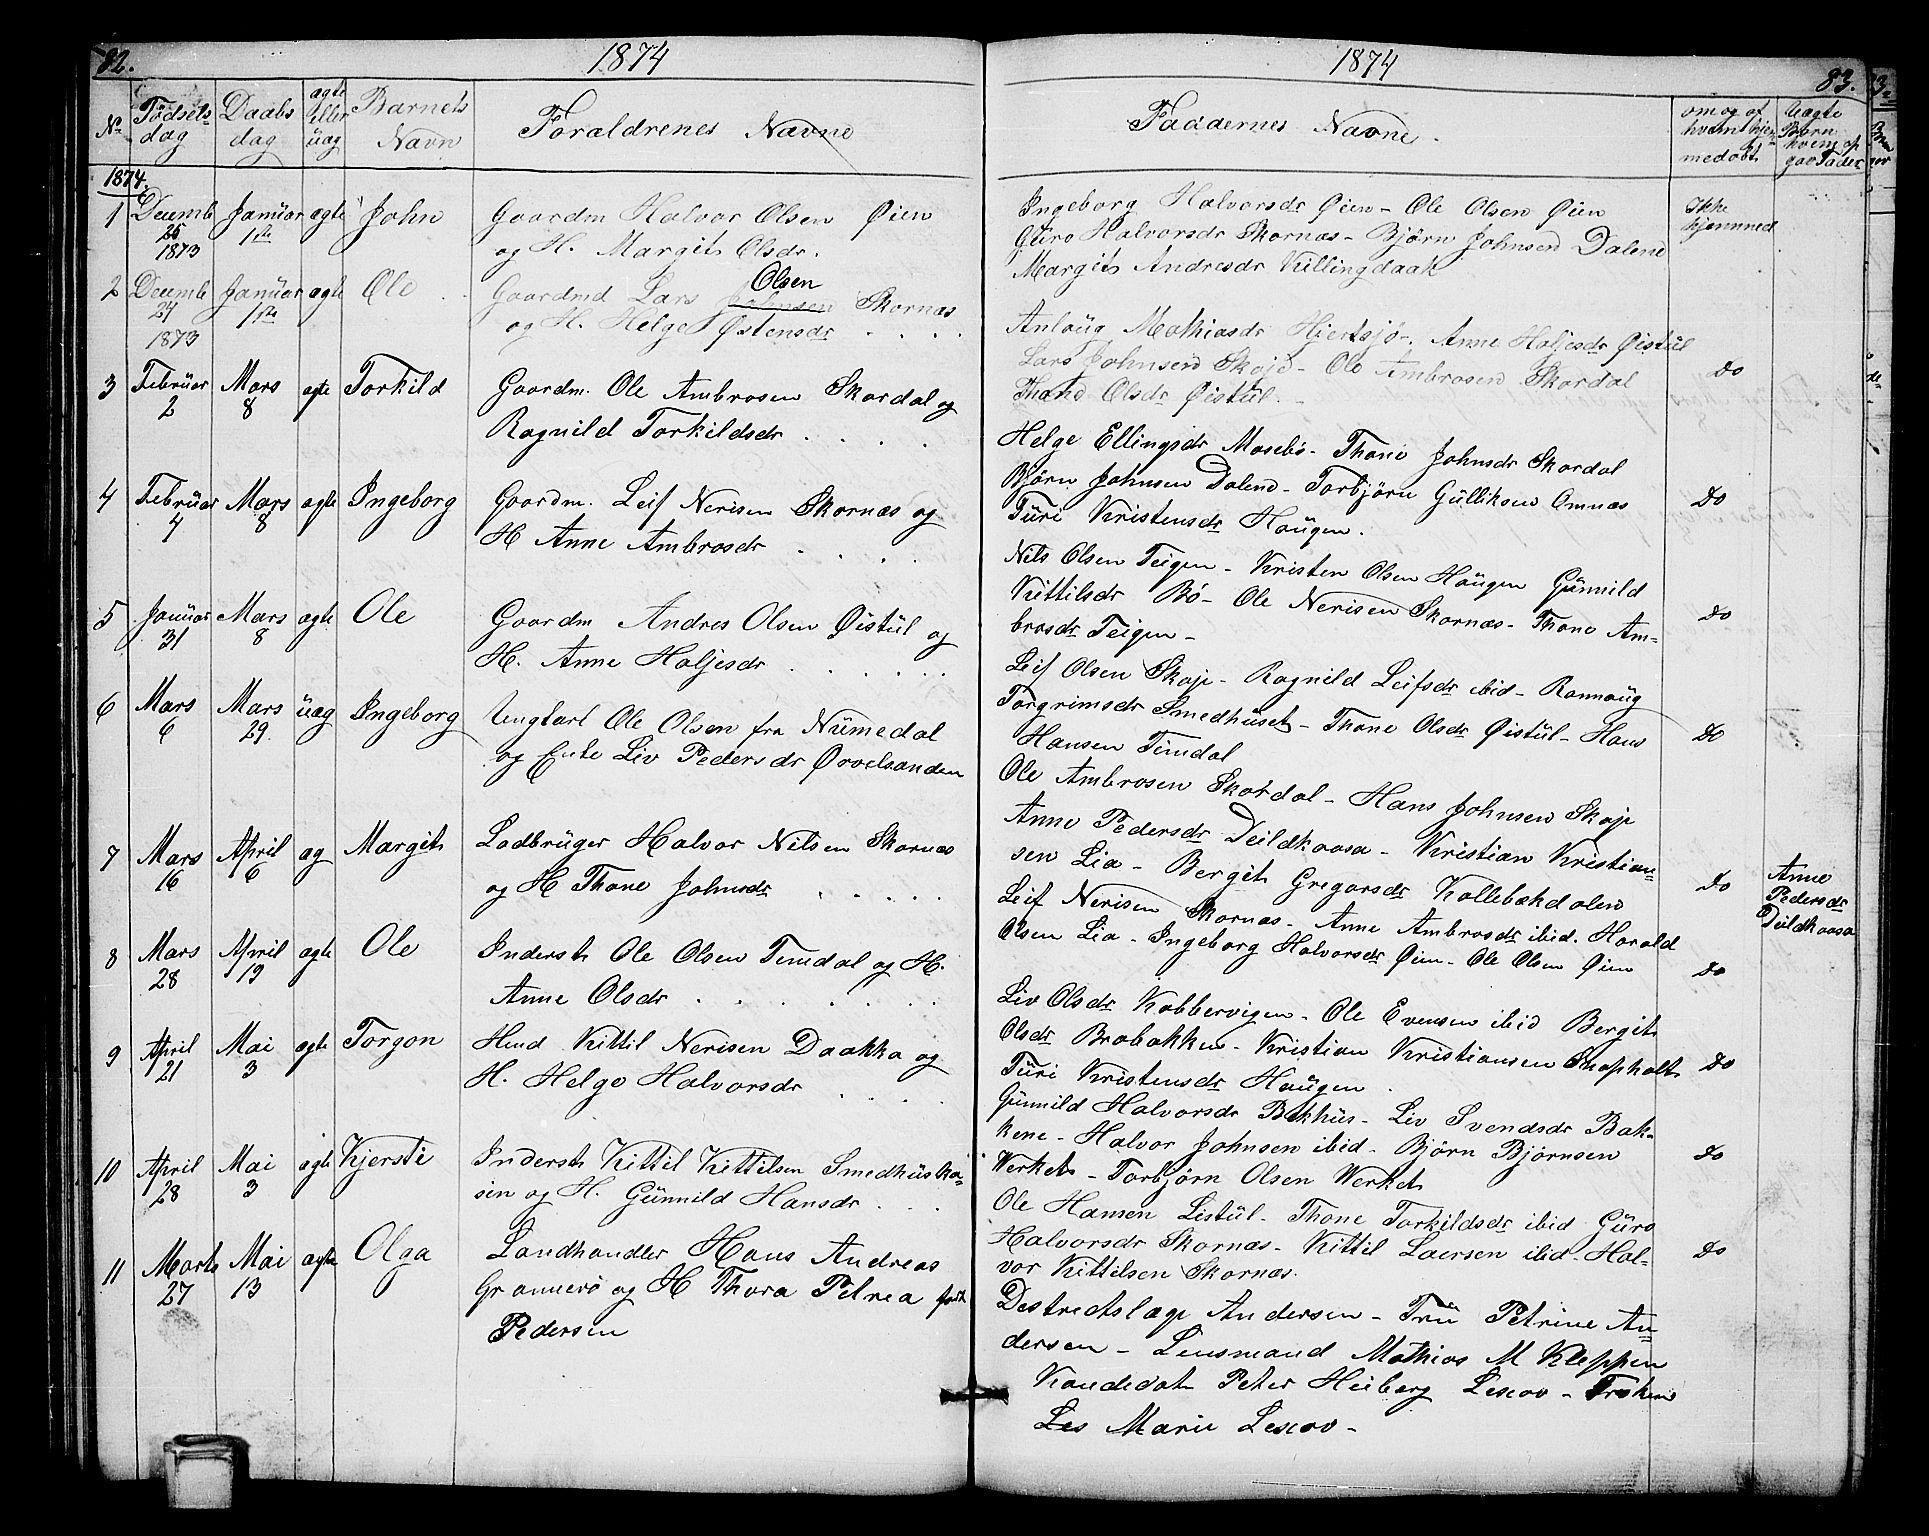 SAKO, Hjartdal kirkebøker, G/Gb/L0002: Klokkerbok nr. II 2, 1854-1884, s. 82-83